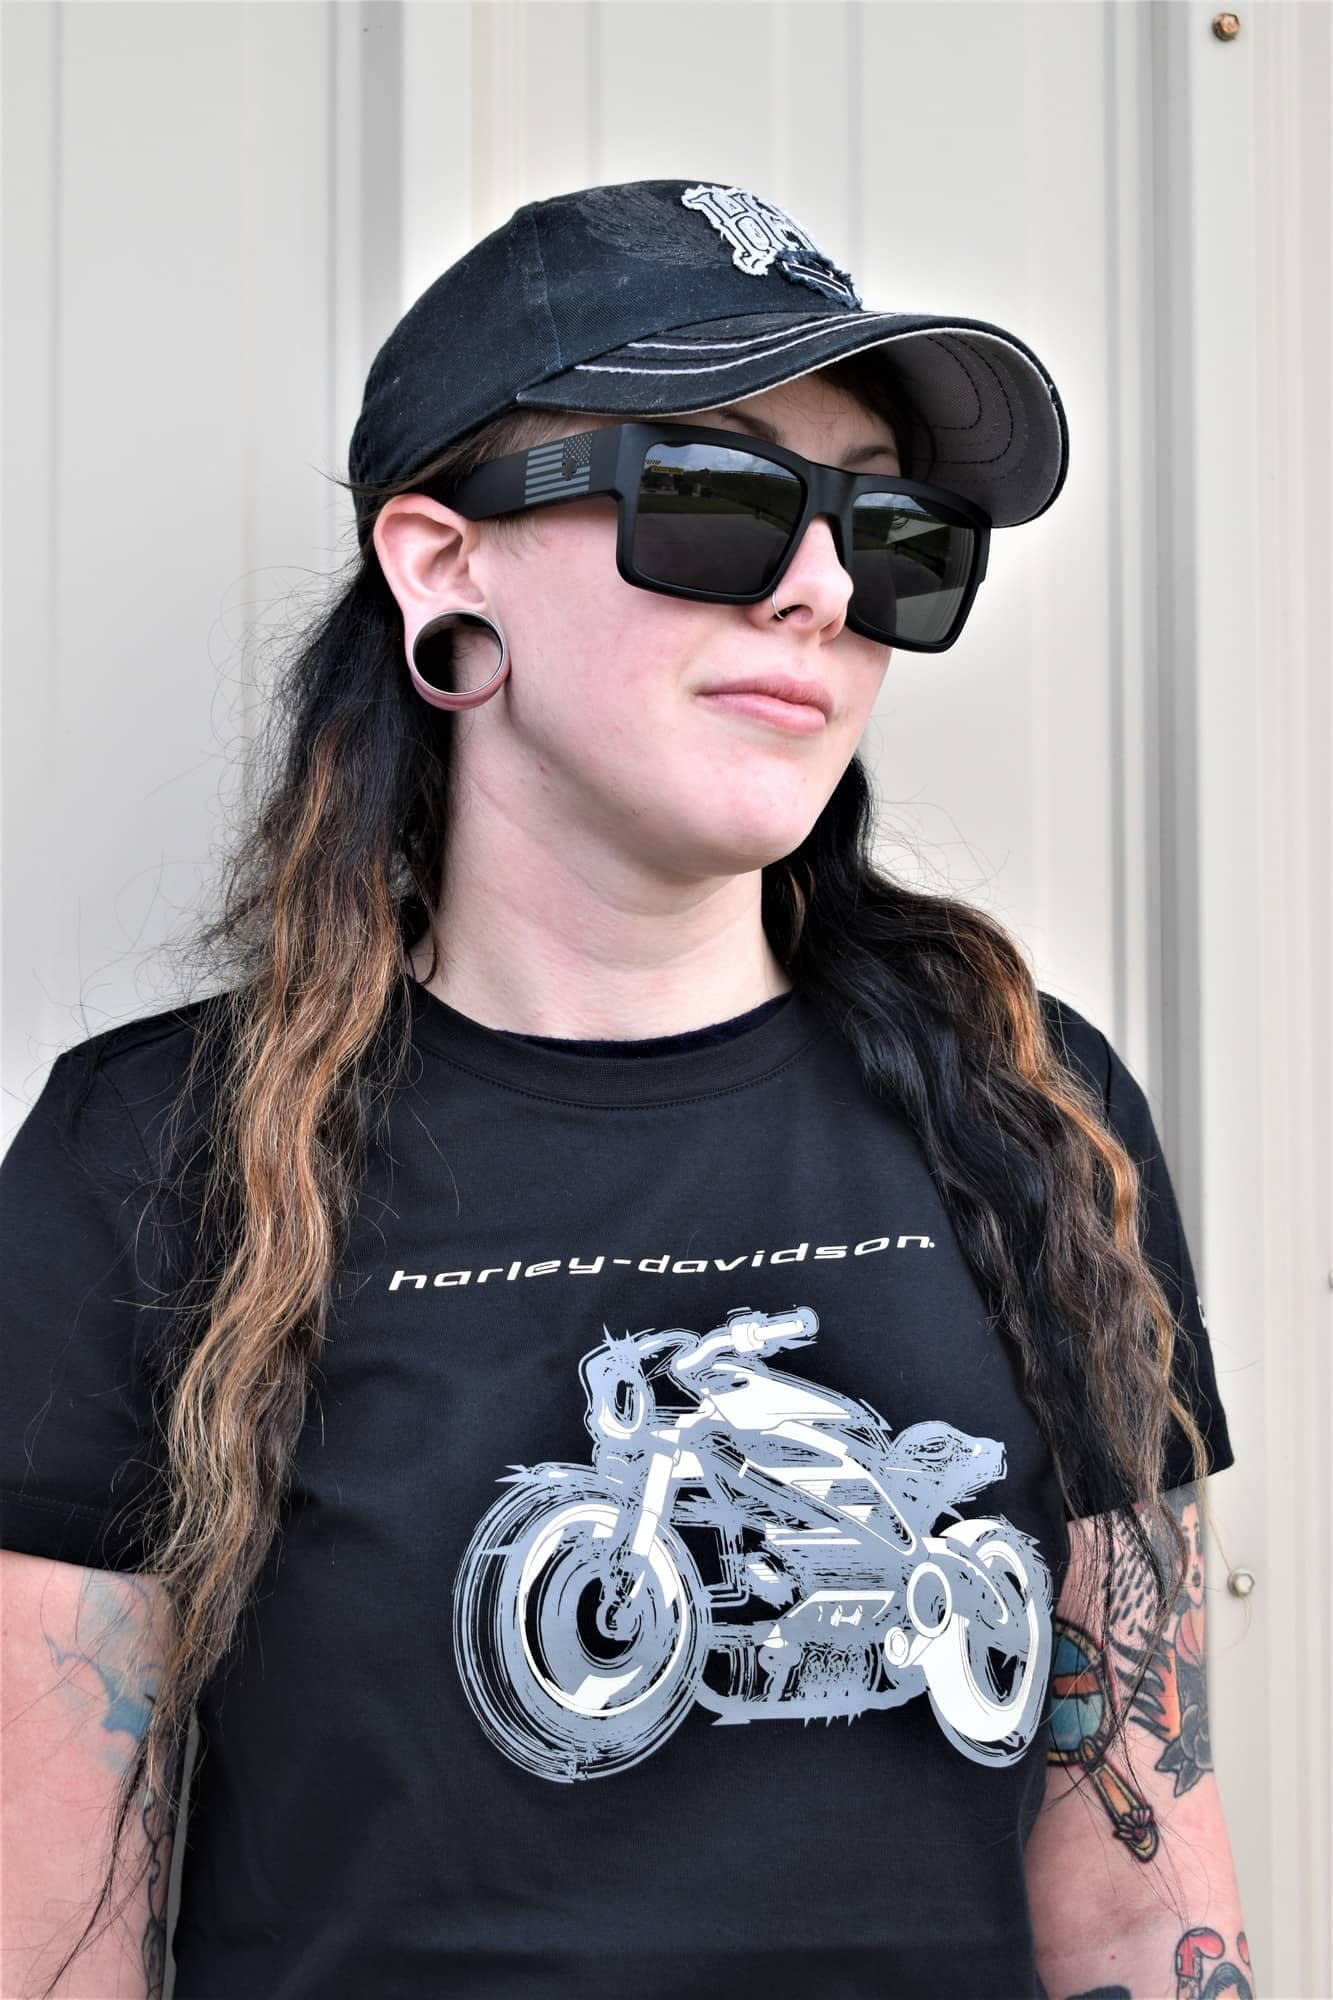 woman wearing a black harley-davidson shirt and hat